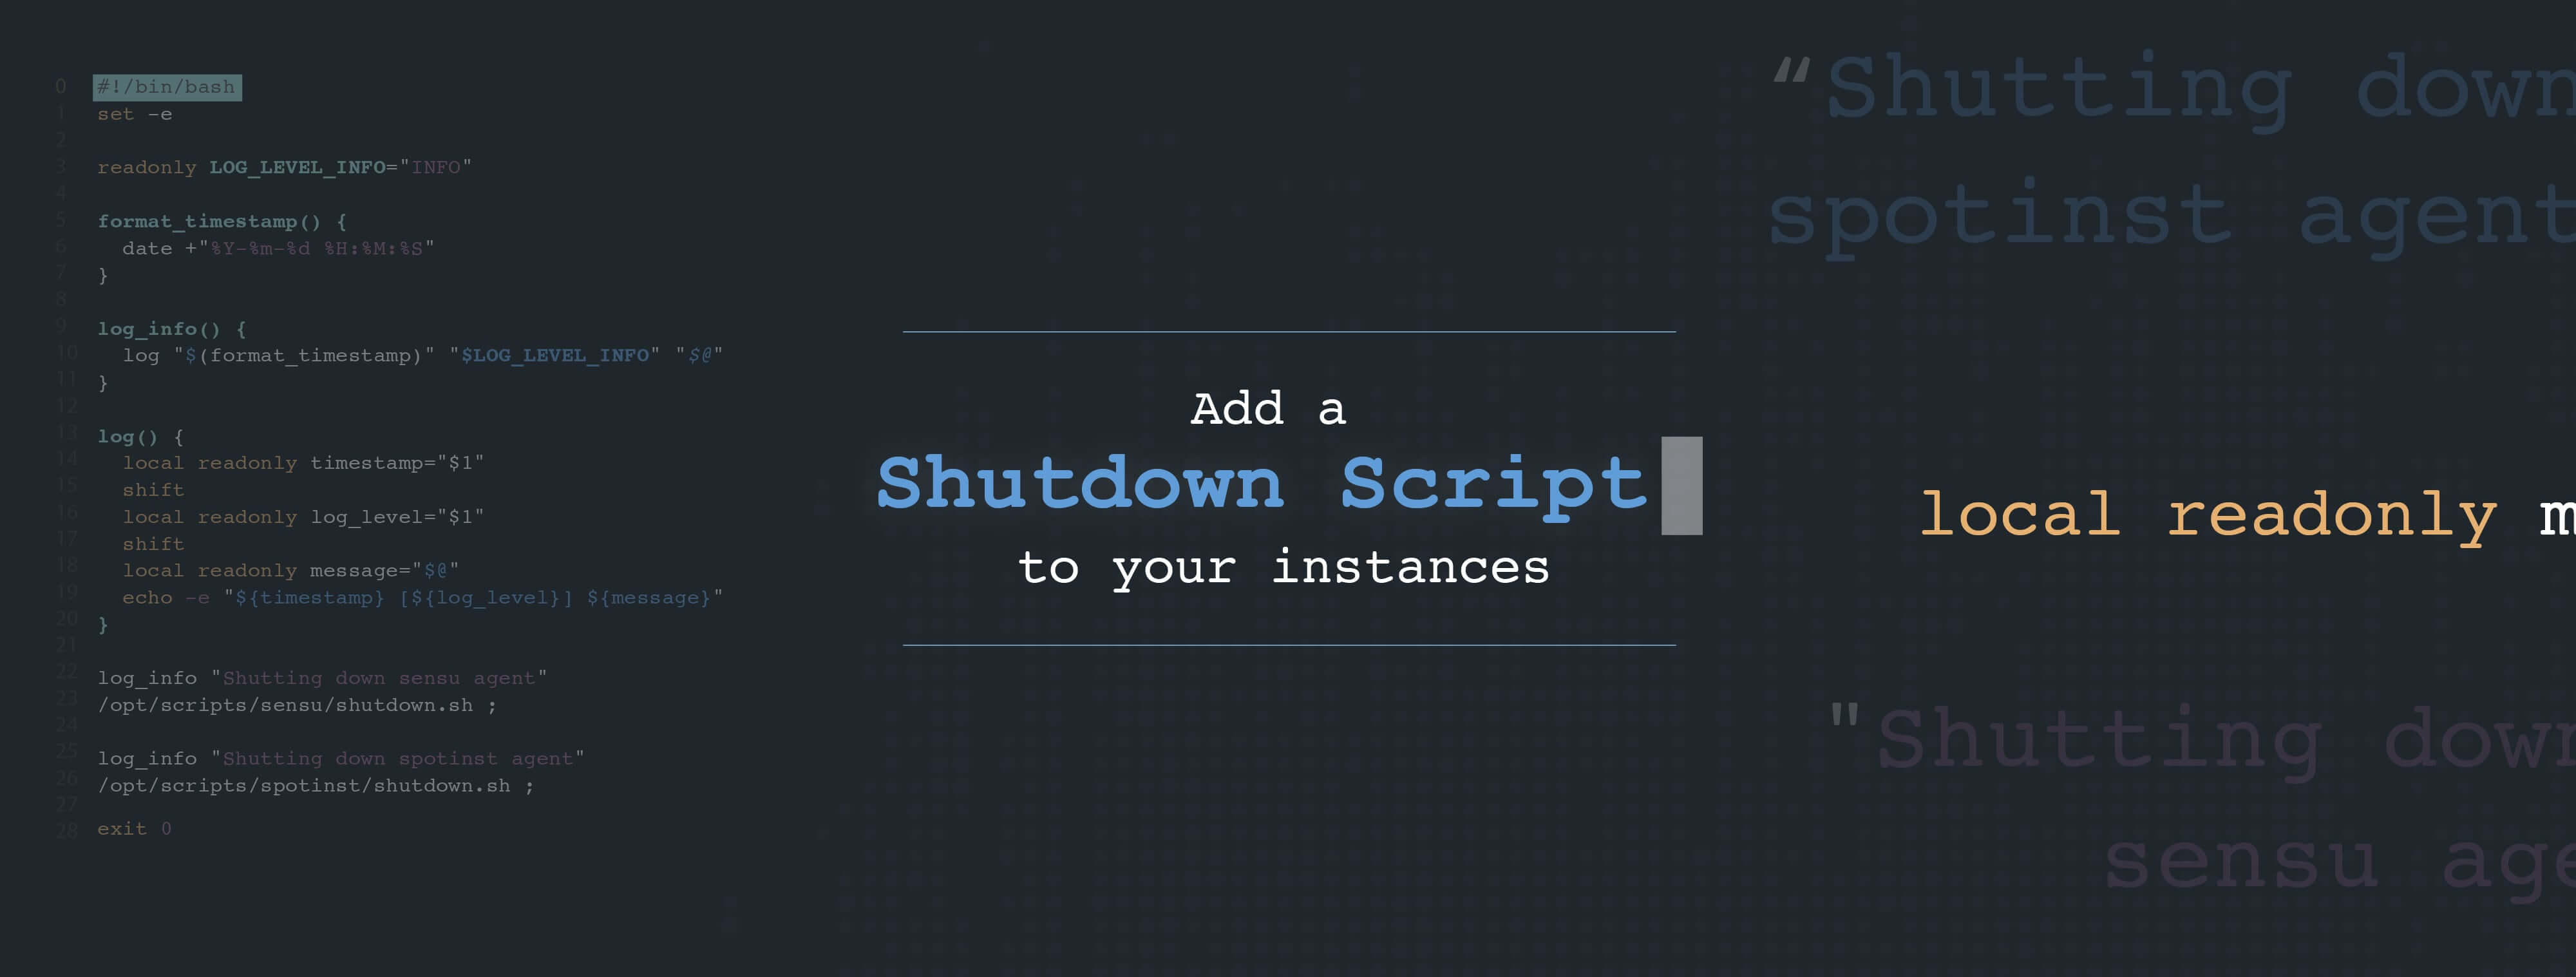 New Feature: Shutdown Scripts for Elastigroup